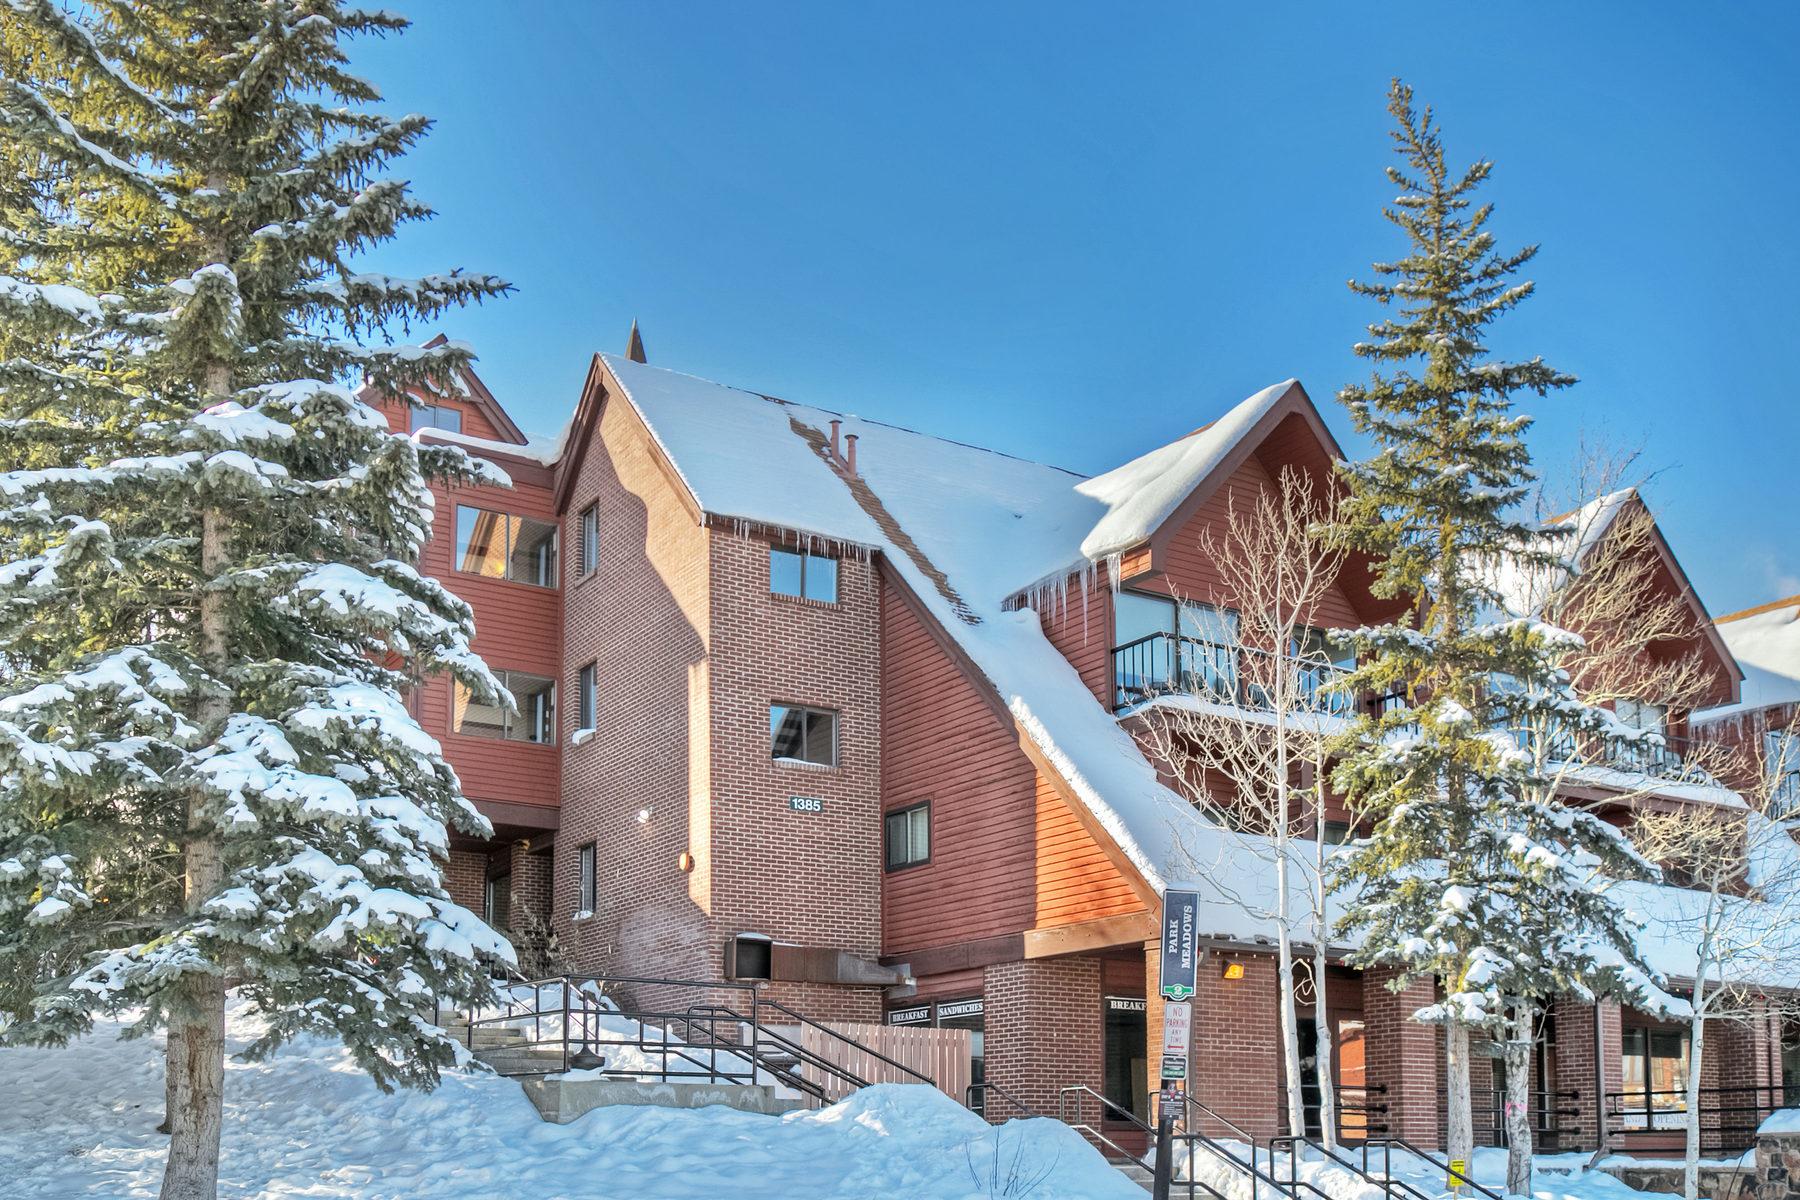 Condomínio para Venda às Ski-in Ski-out at the Base of Park City Mountain 1385 Lowell Ave #201 Park City, Utah 84060 Estados Unidos